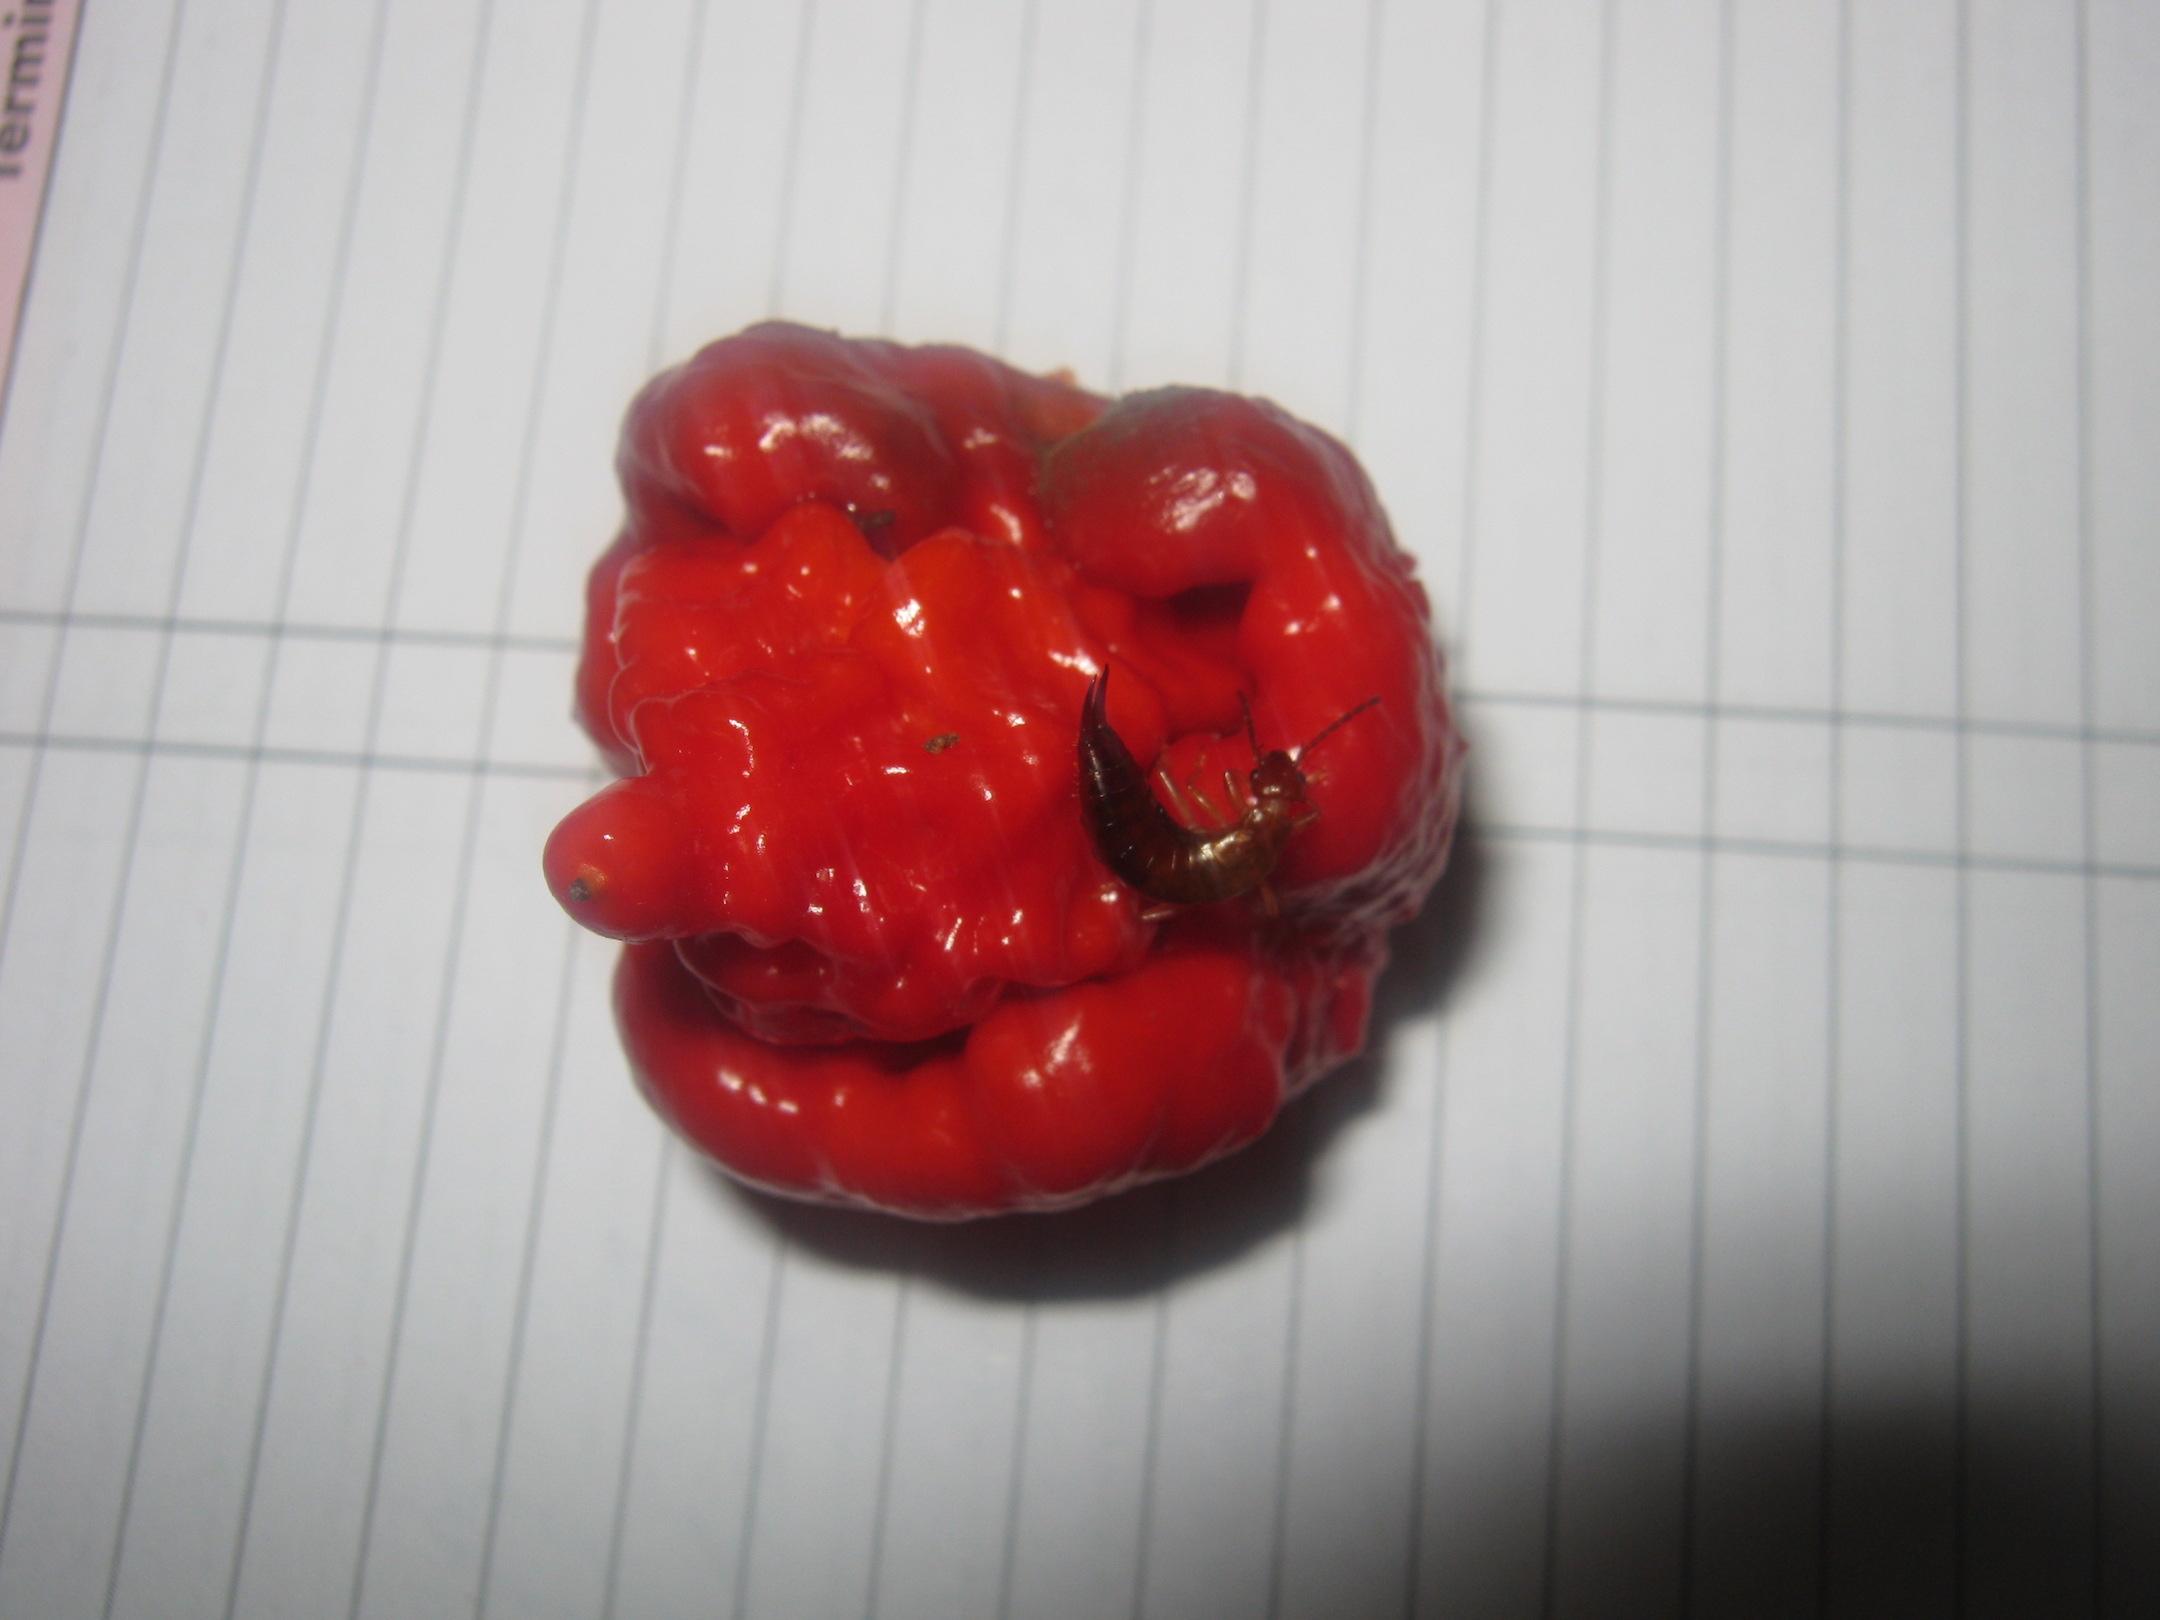 Ear wig on damaged Carolina Reaper chili pod